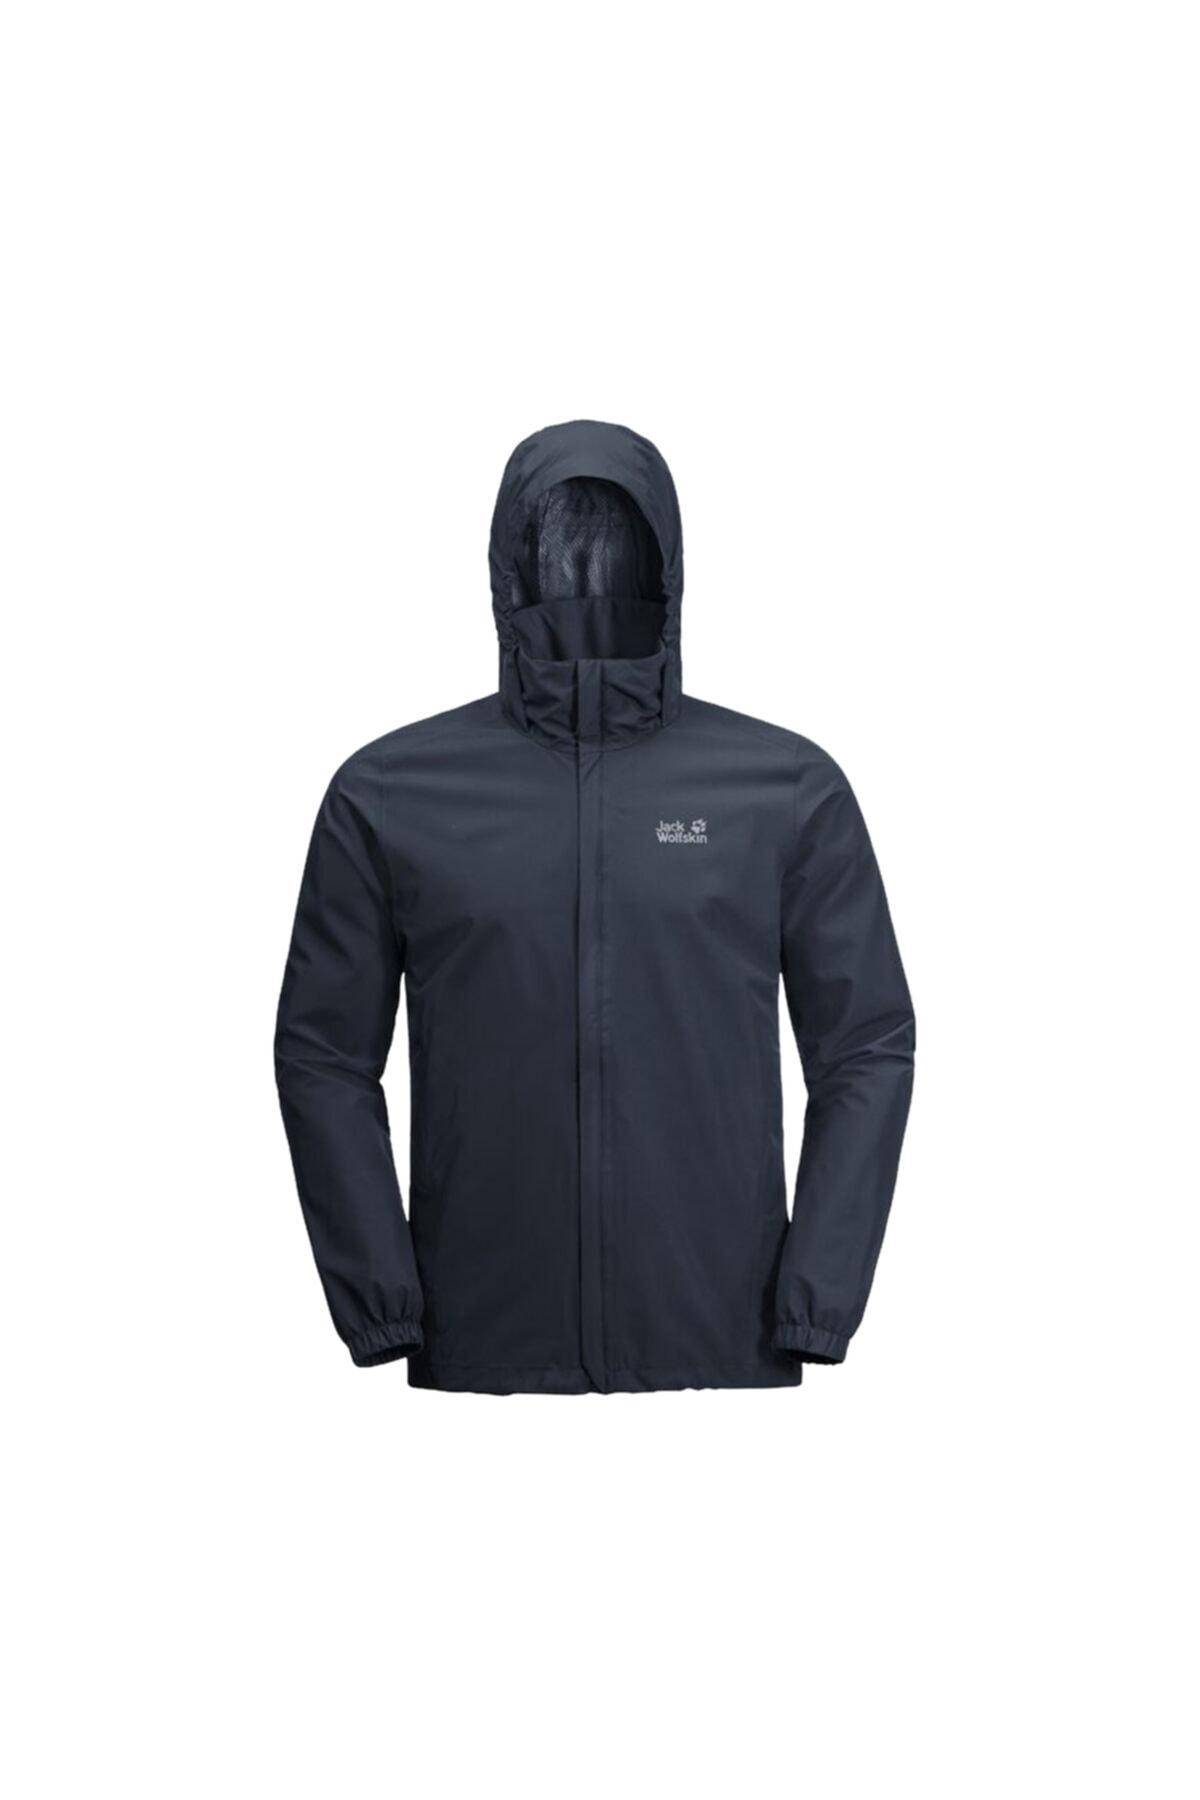 Jack Wolfskin Erkek Lacivert Stormy Point Jacket Outdoor Ceketi M 2